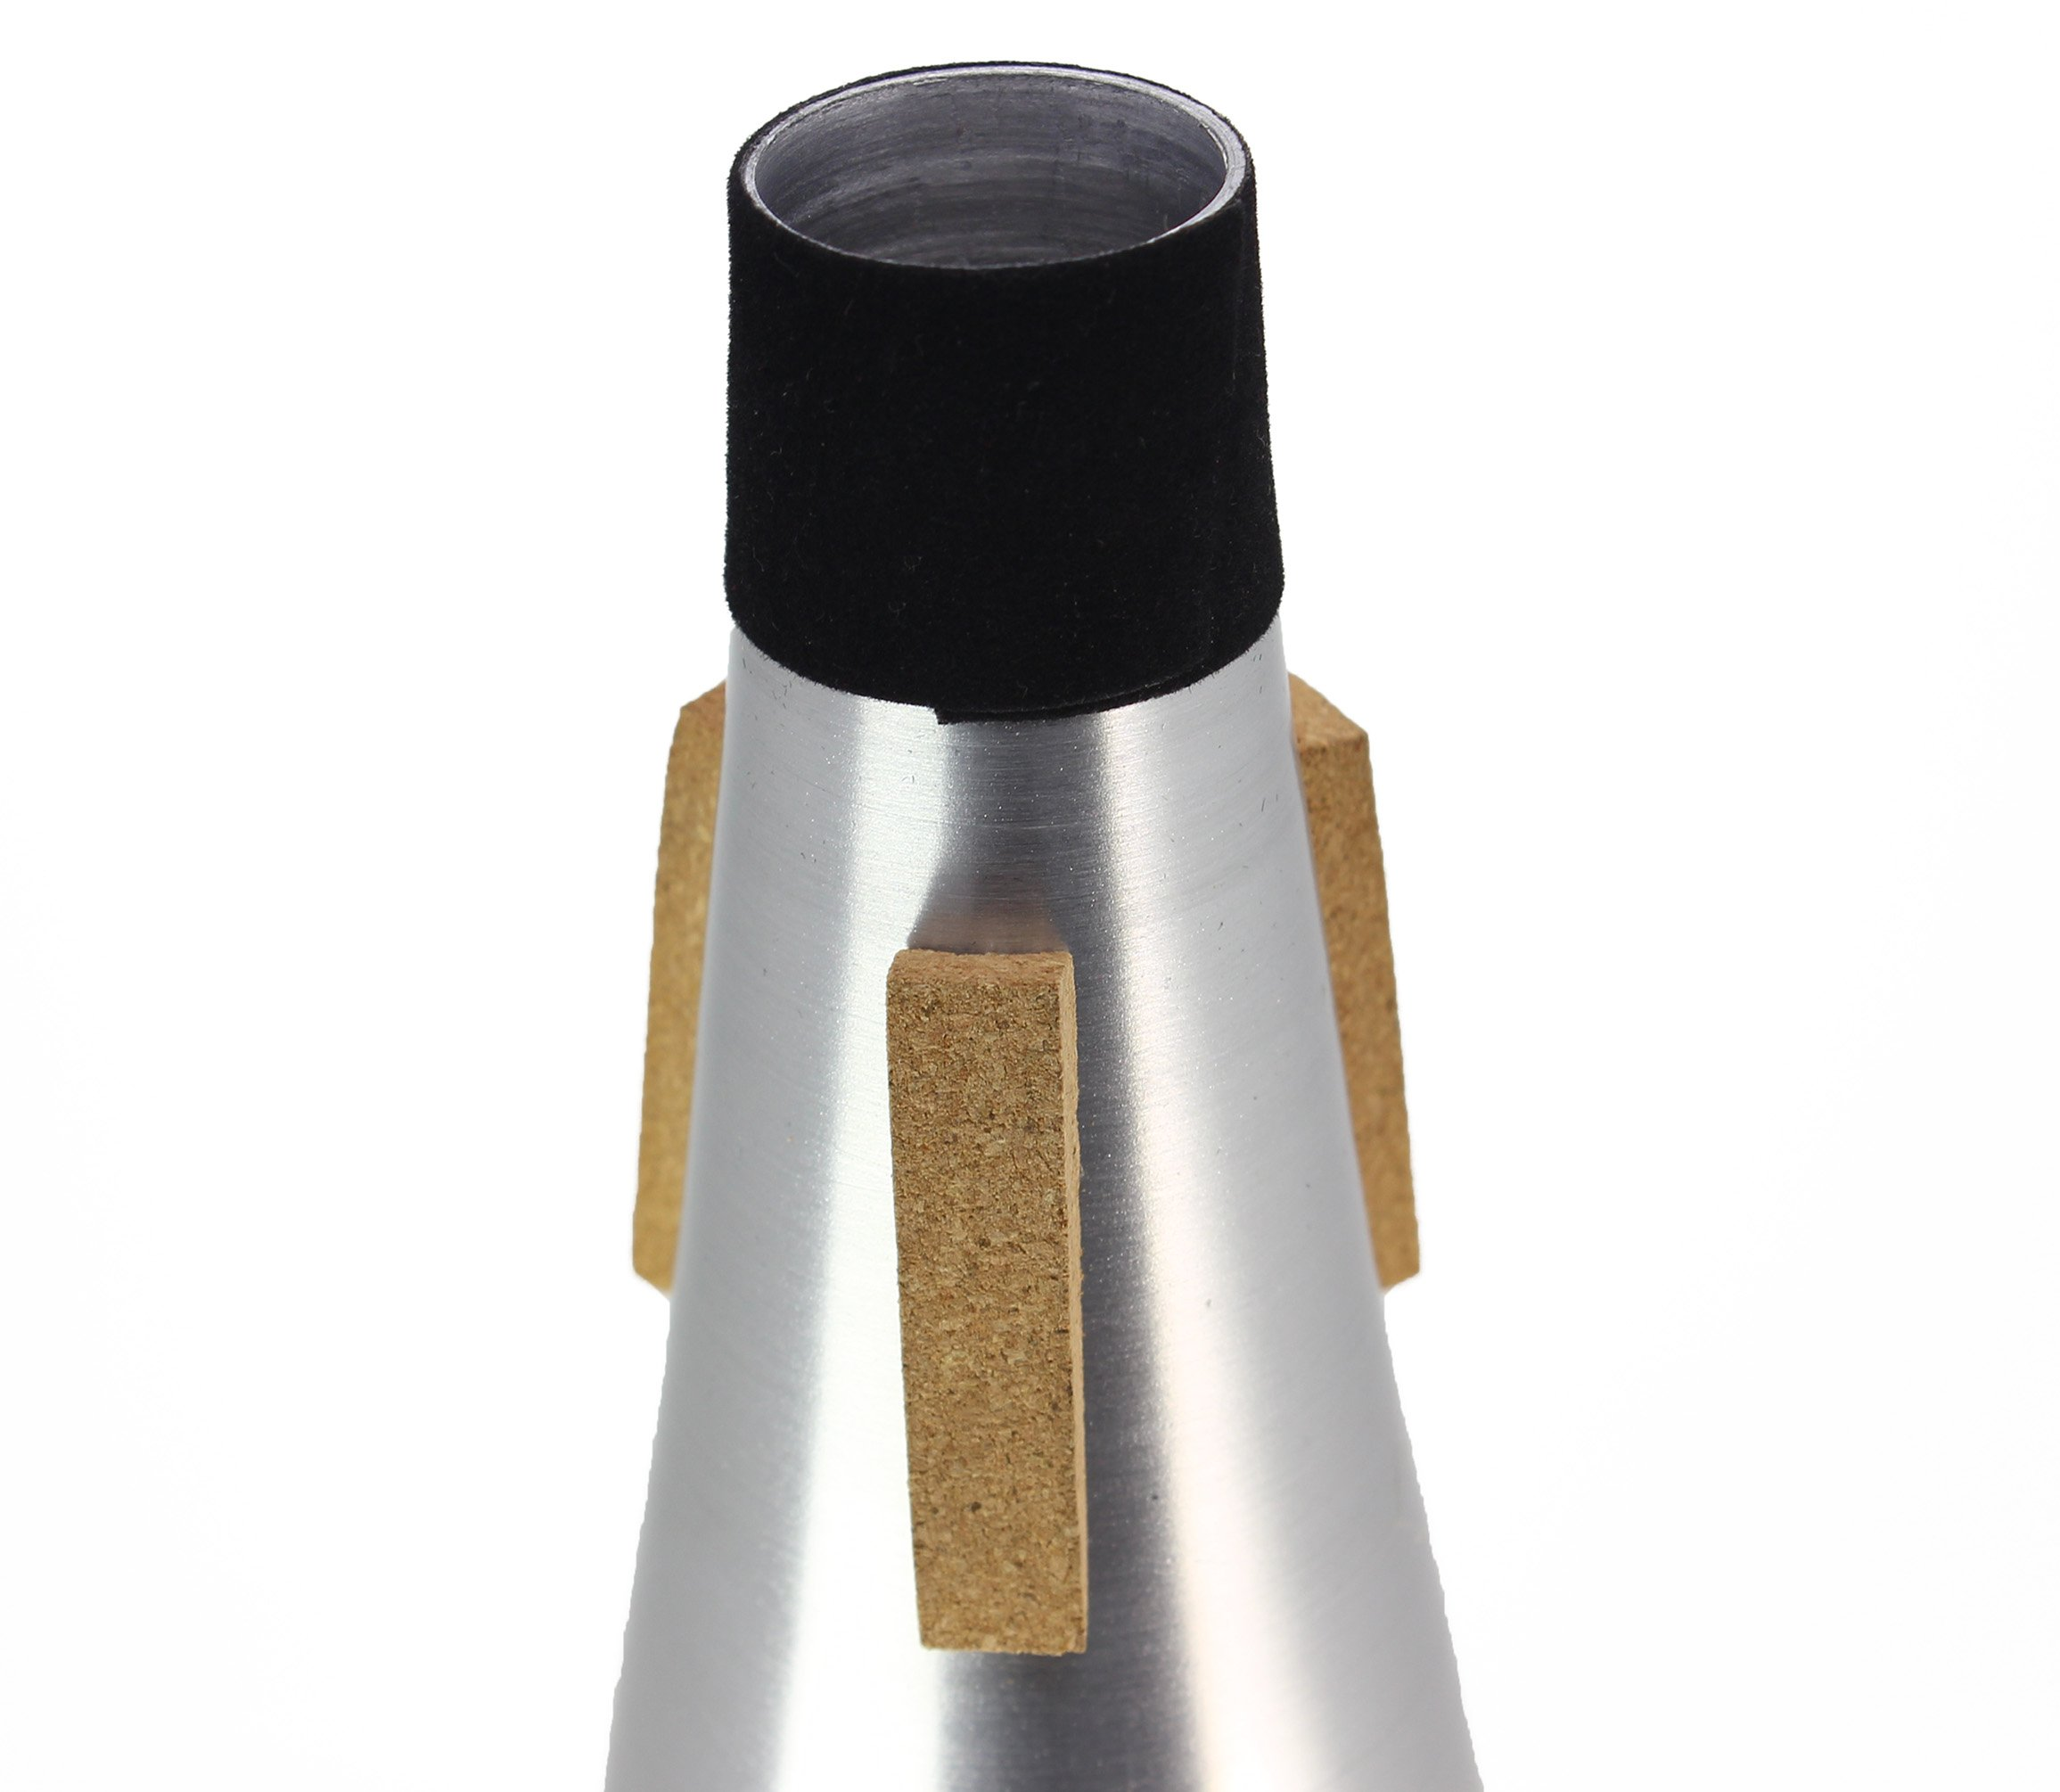 LotFancy Trombone Straight Mute, Aluminum by LotFancy (Image #4)